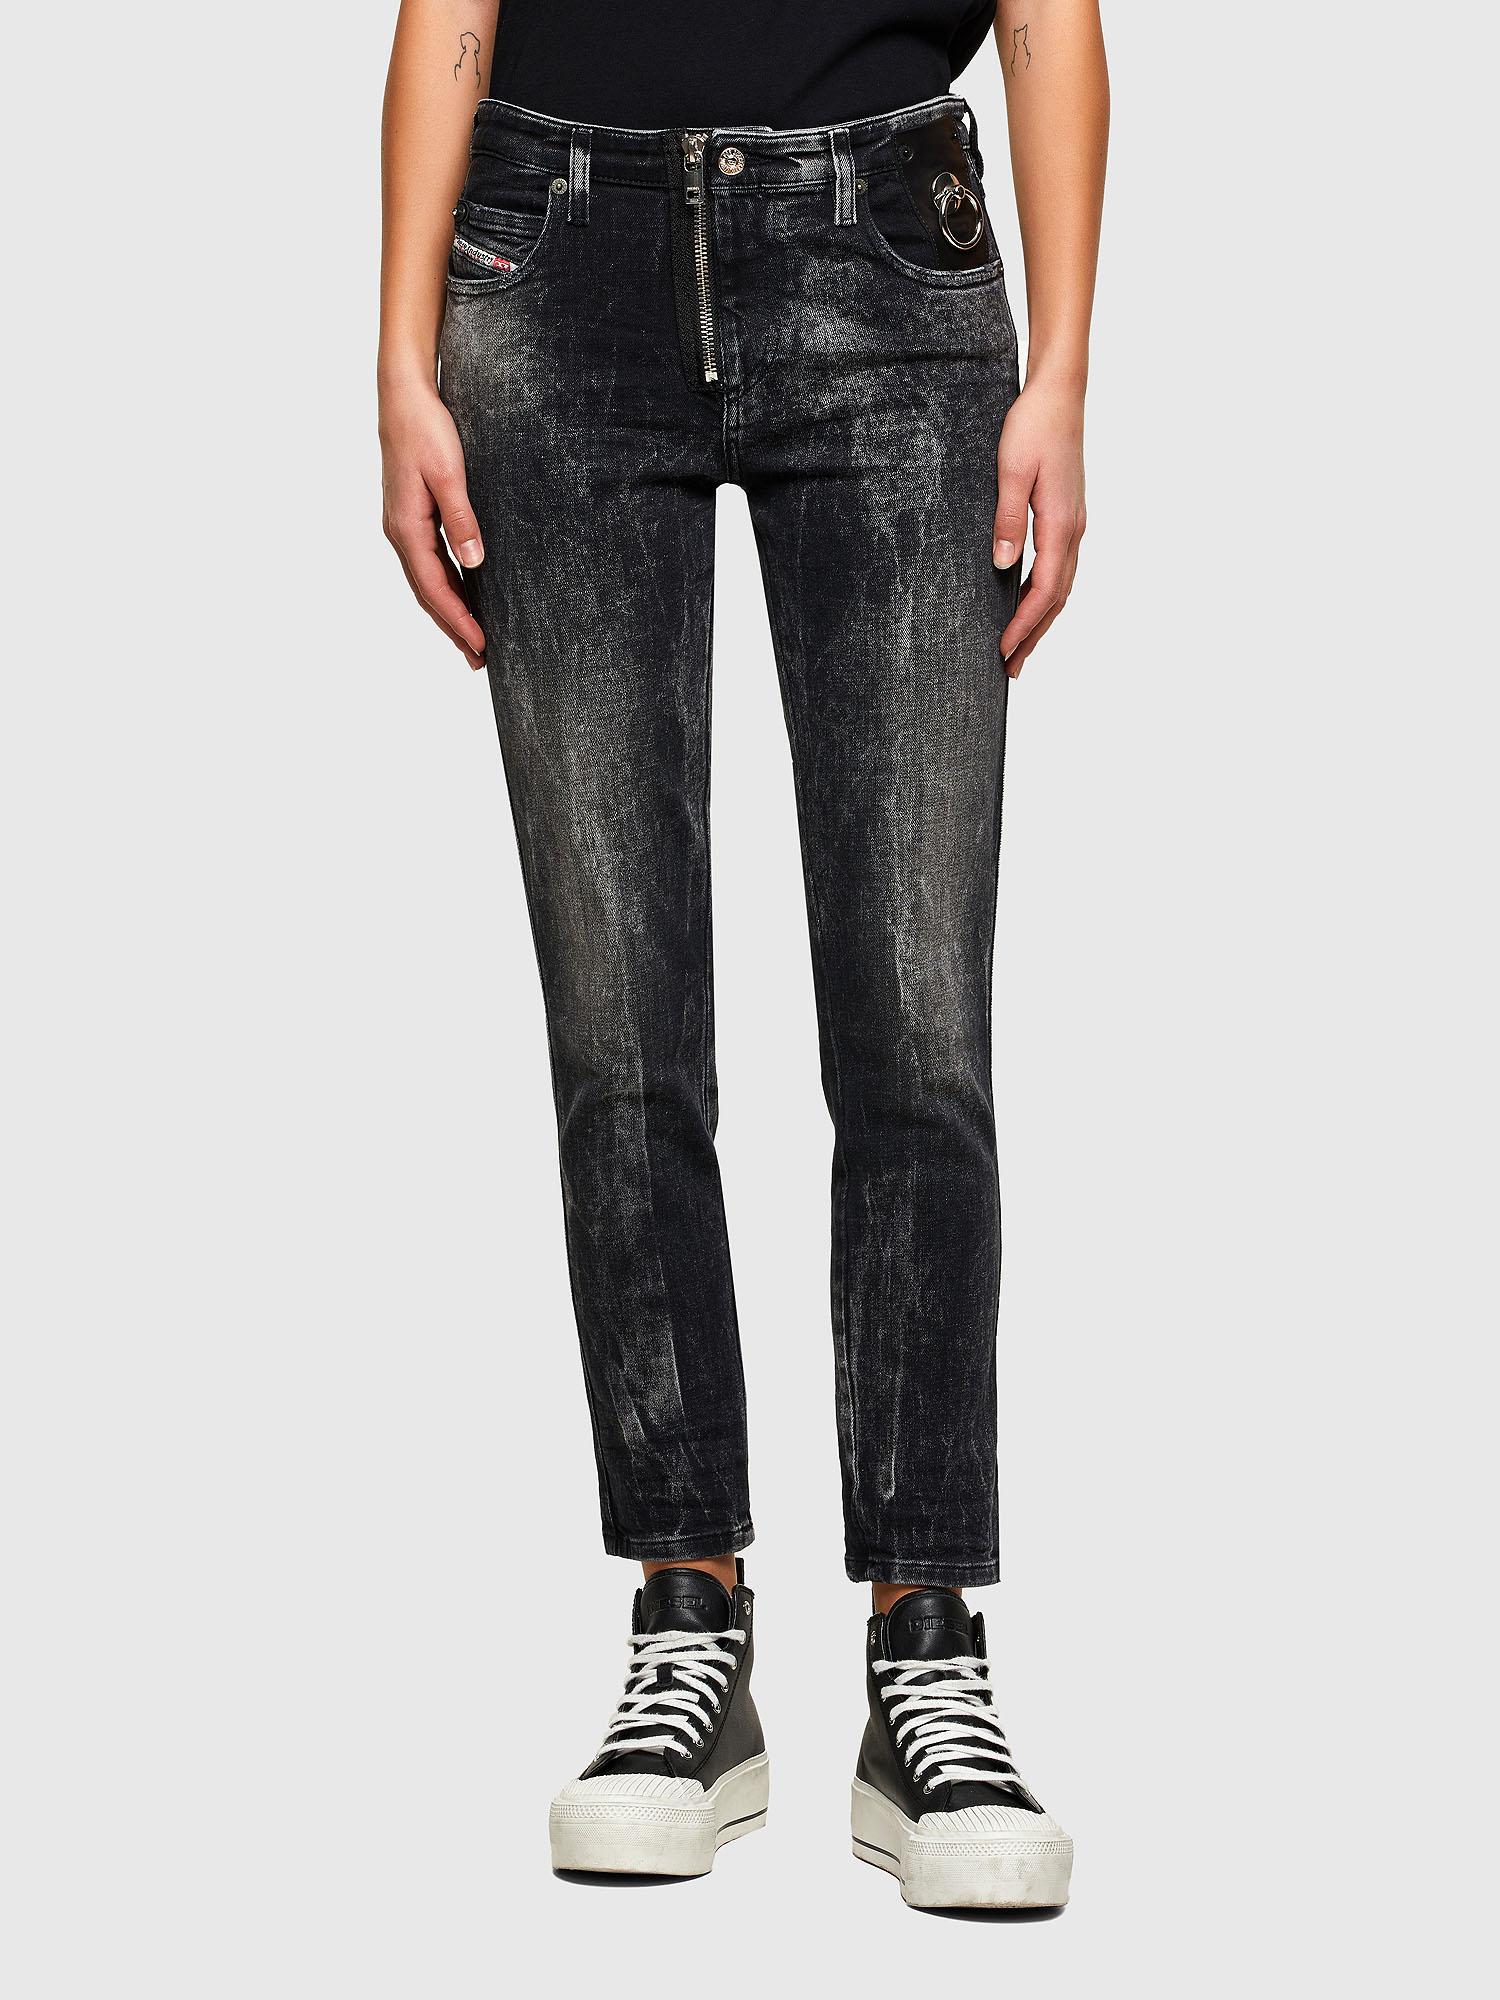 Diesel - Babhila 009PX, Black/Dark grey - Jeans - Image 1